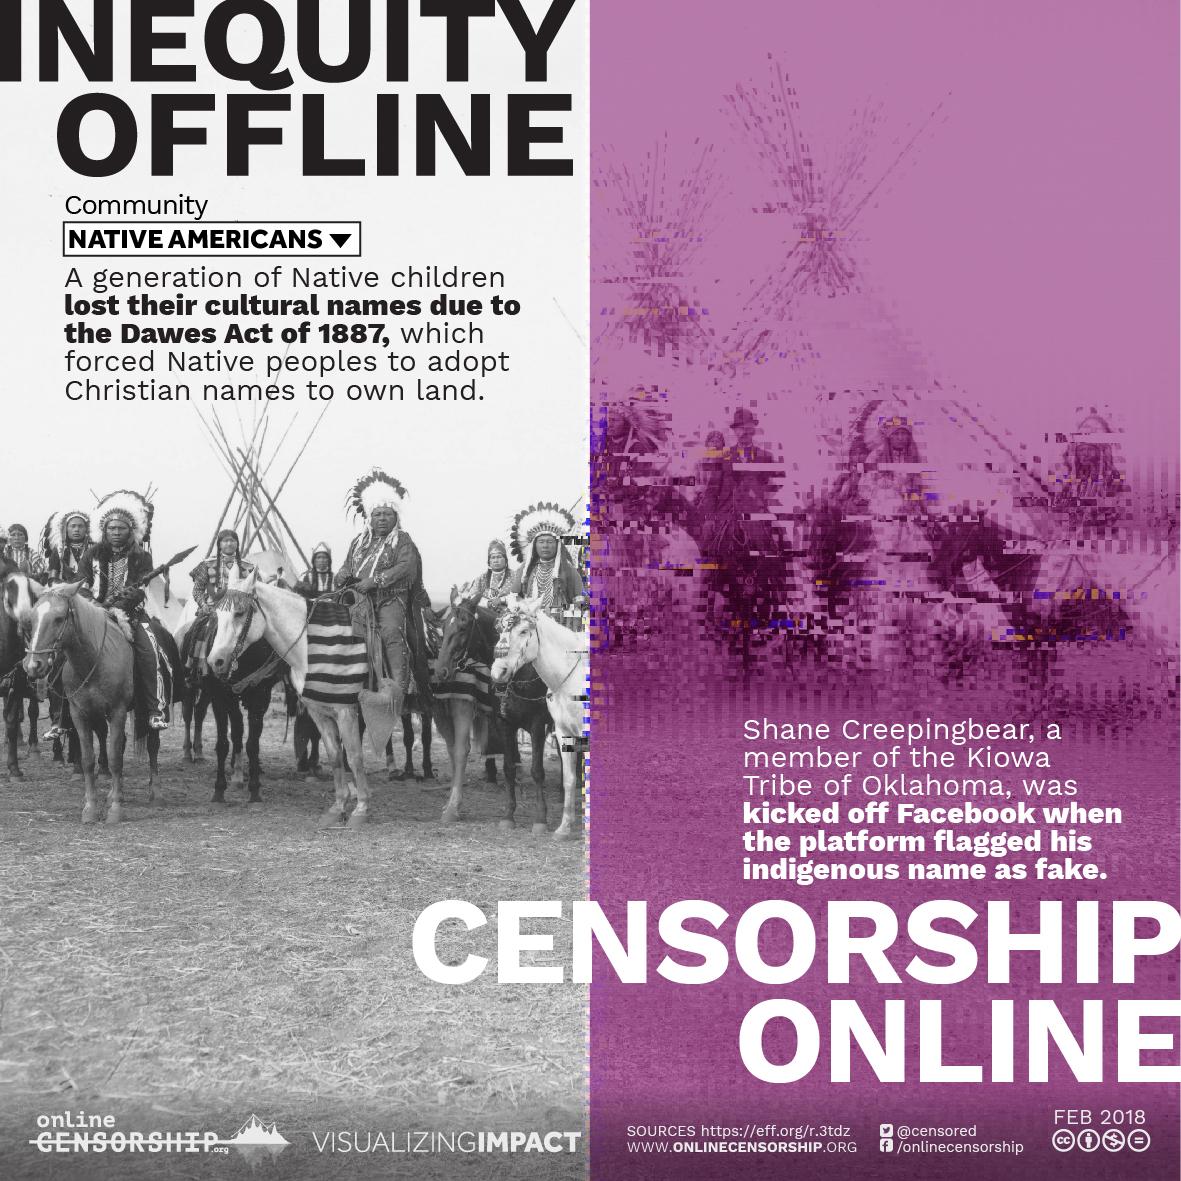 Offline/Online: Native Americans